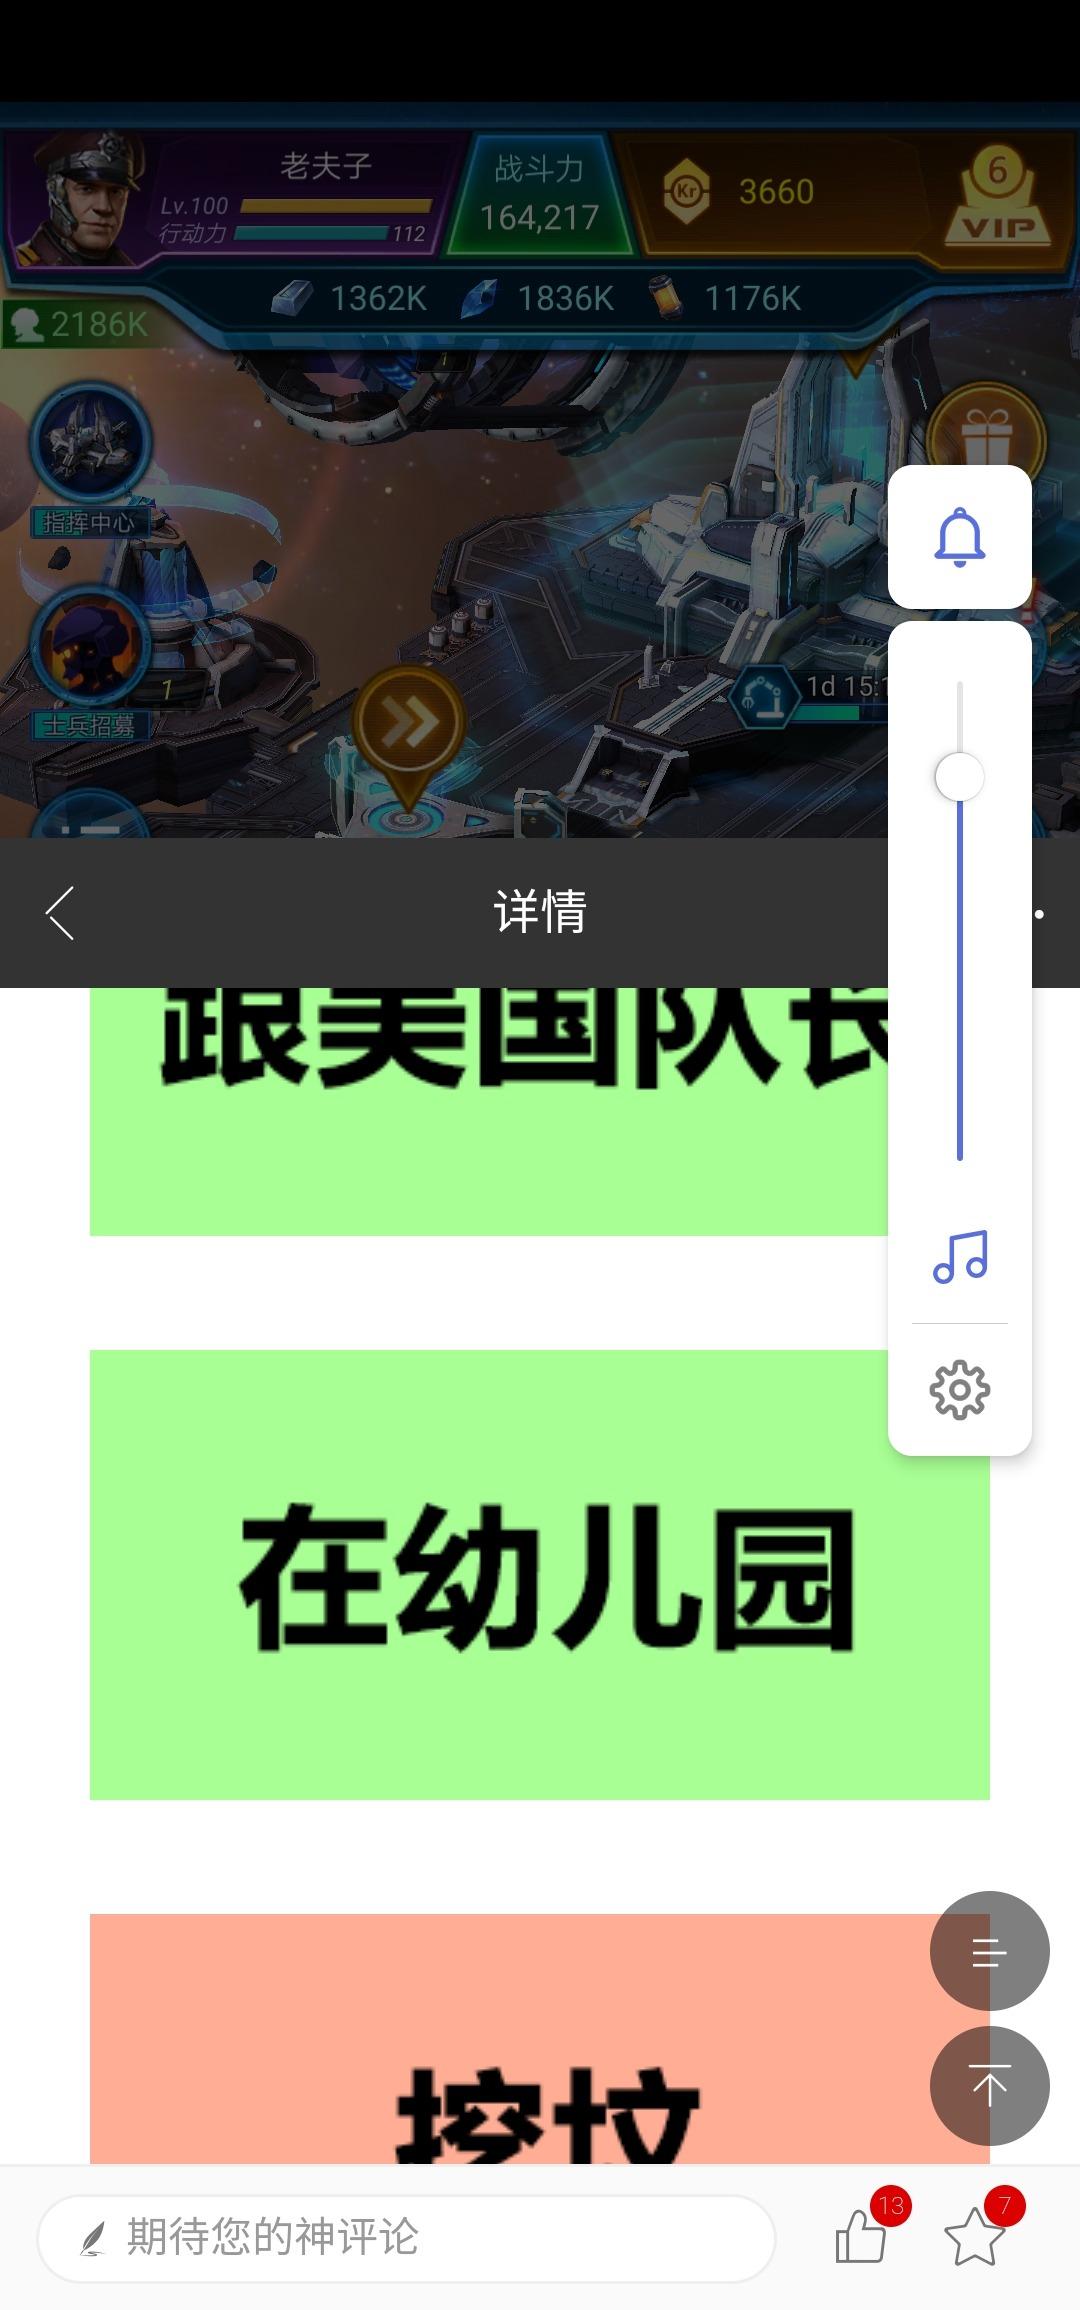 Screenshot_20190725_181417_com.jedigames.p16s.luobo.jpg